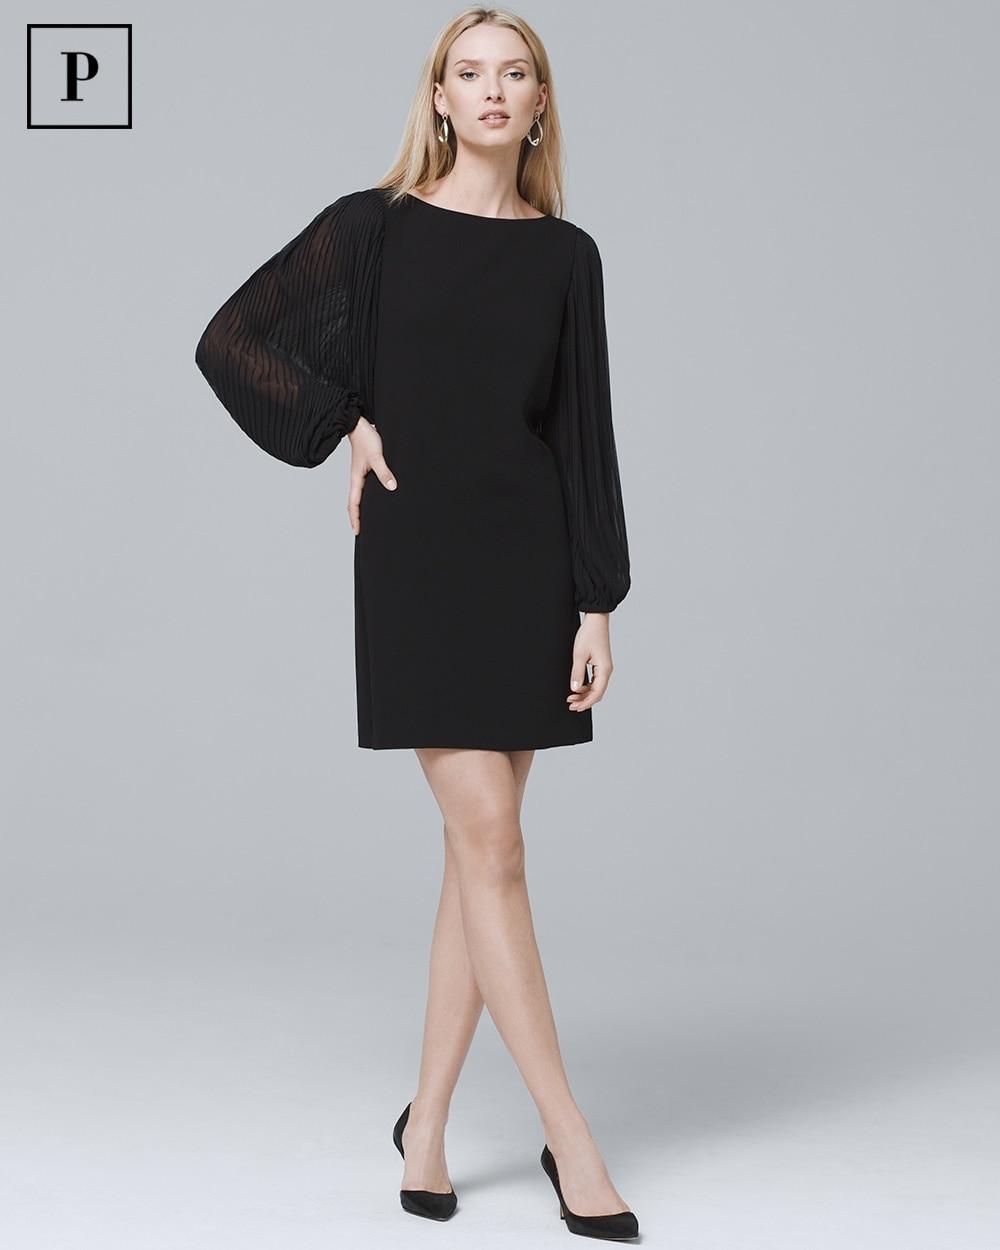 Petite Chiffon Sleeve Black Shift Dress White House Black Market